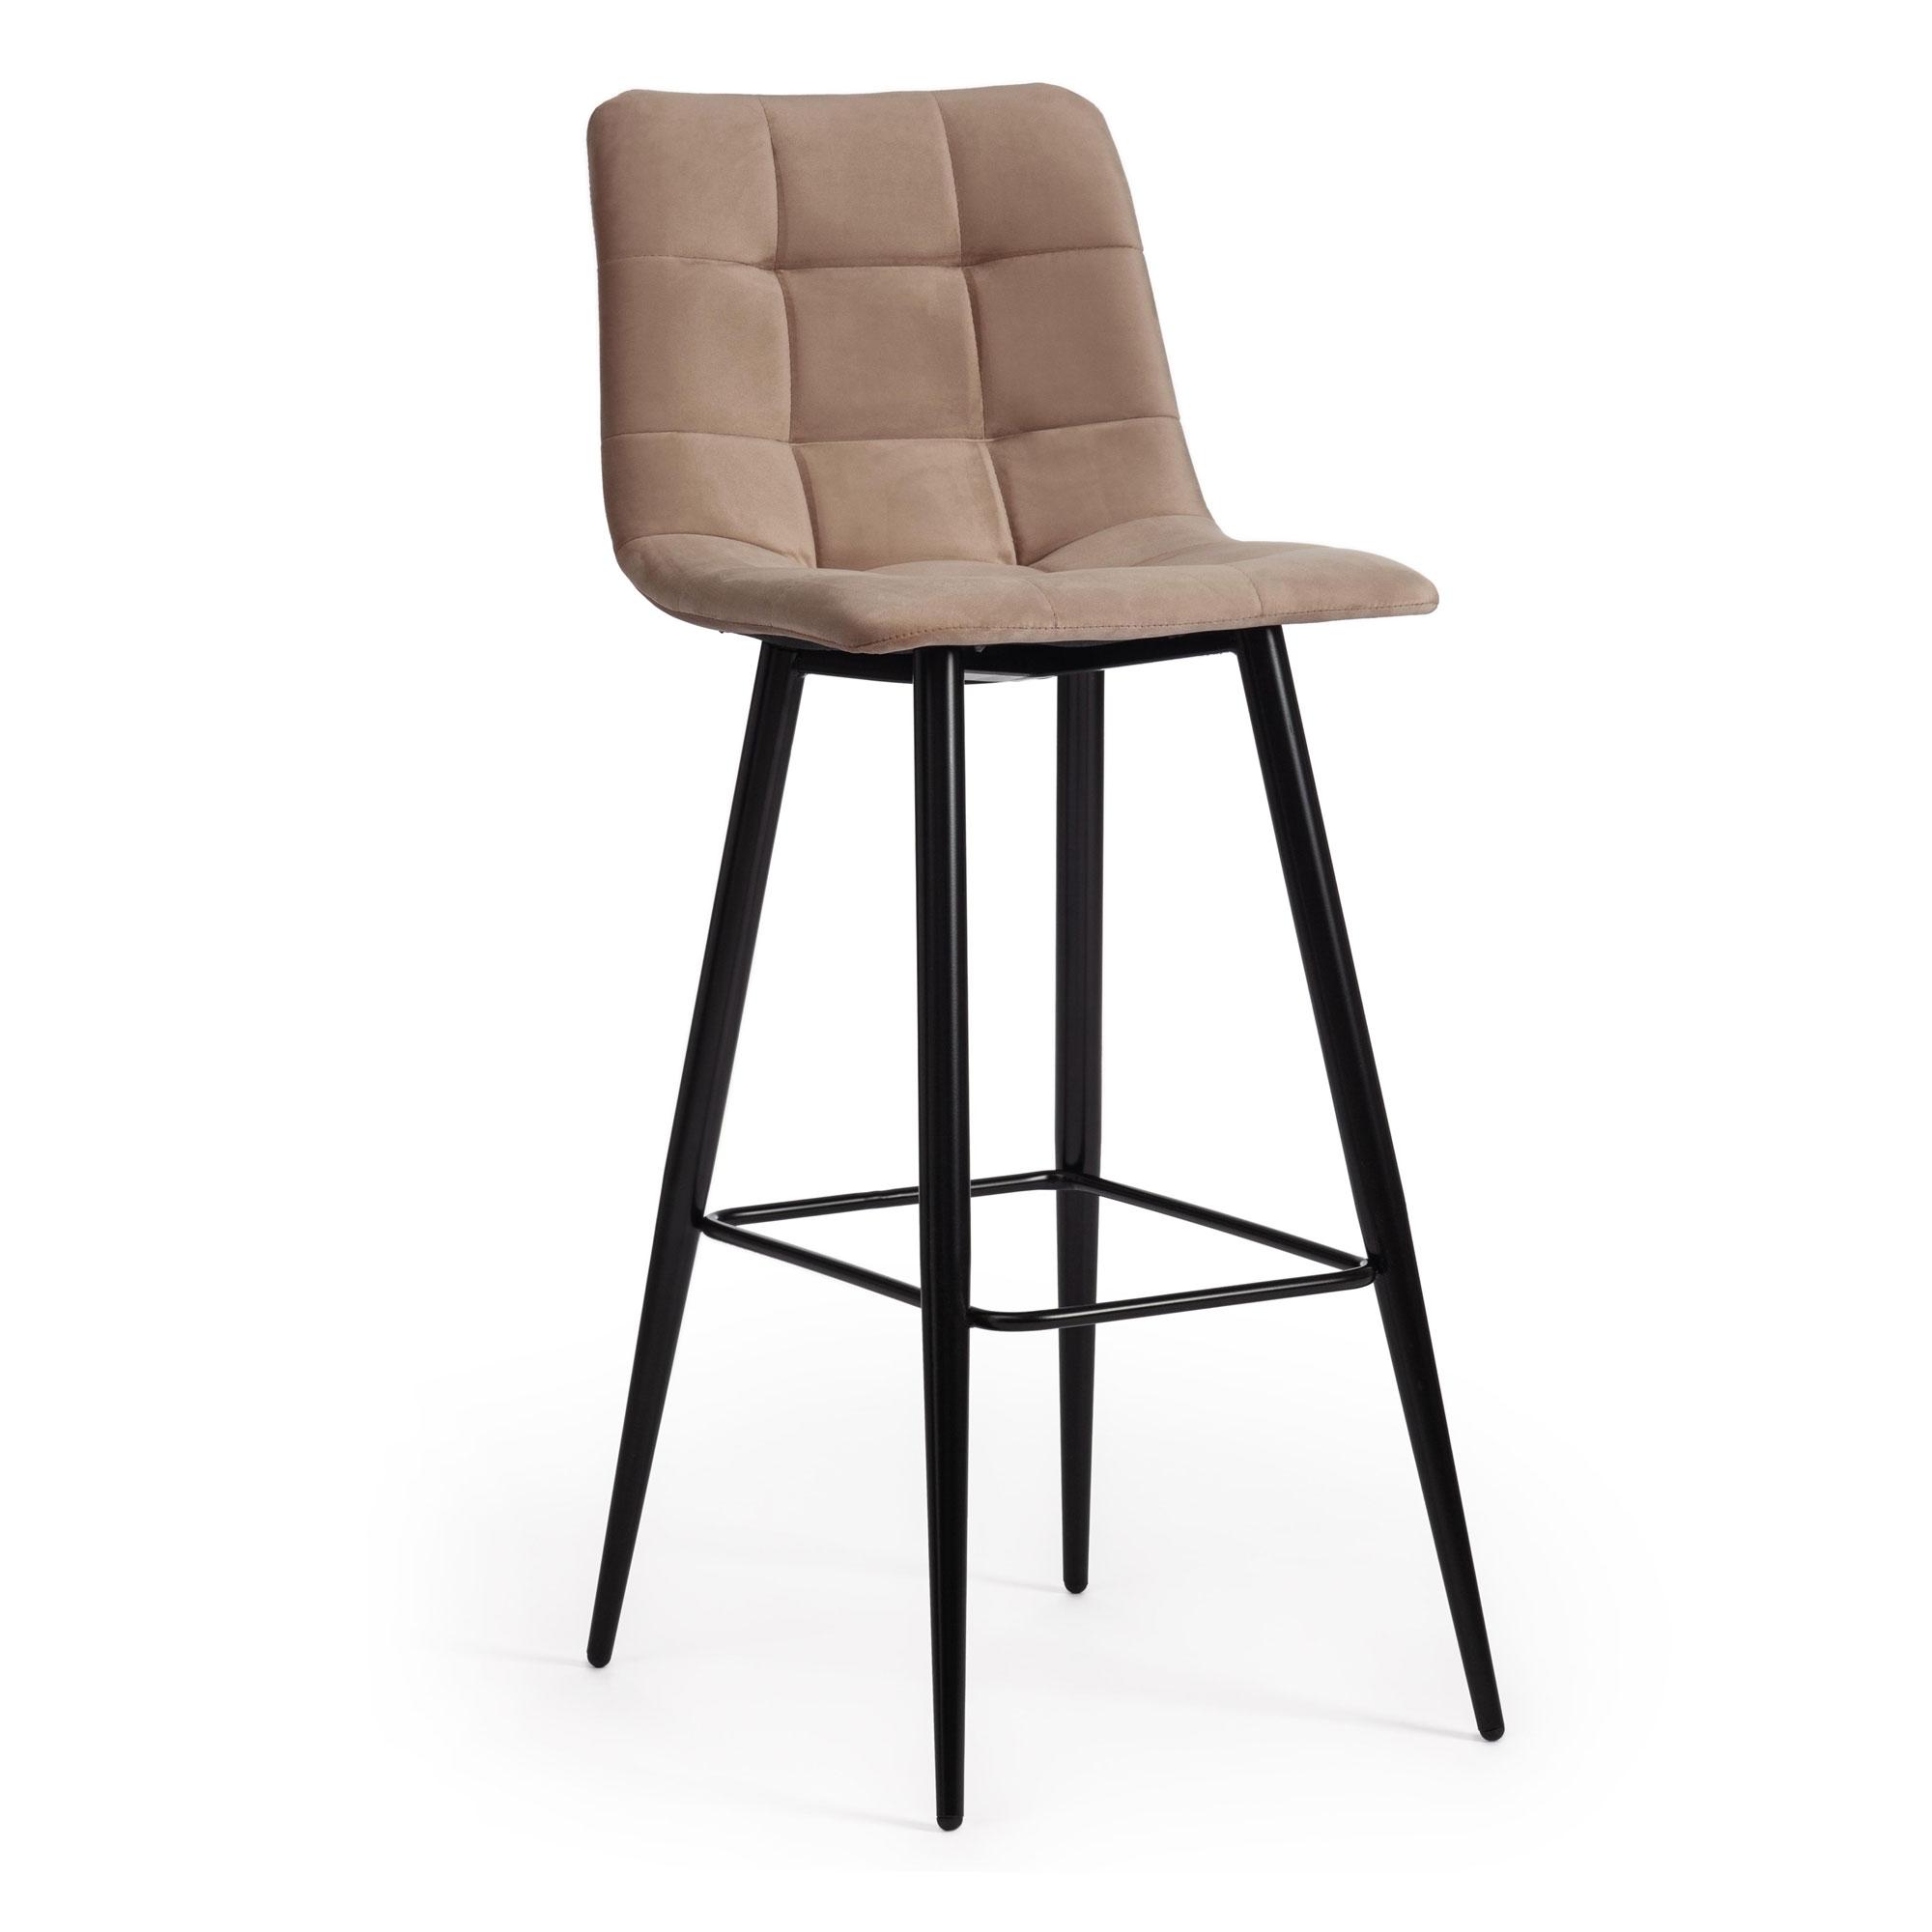 Стул барный ТС 50х44х104 см бежевый барный стул tc черный 5xx43x102 5 см